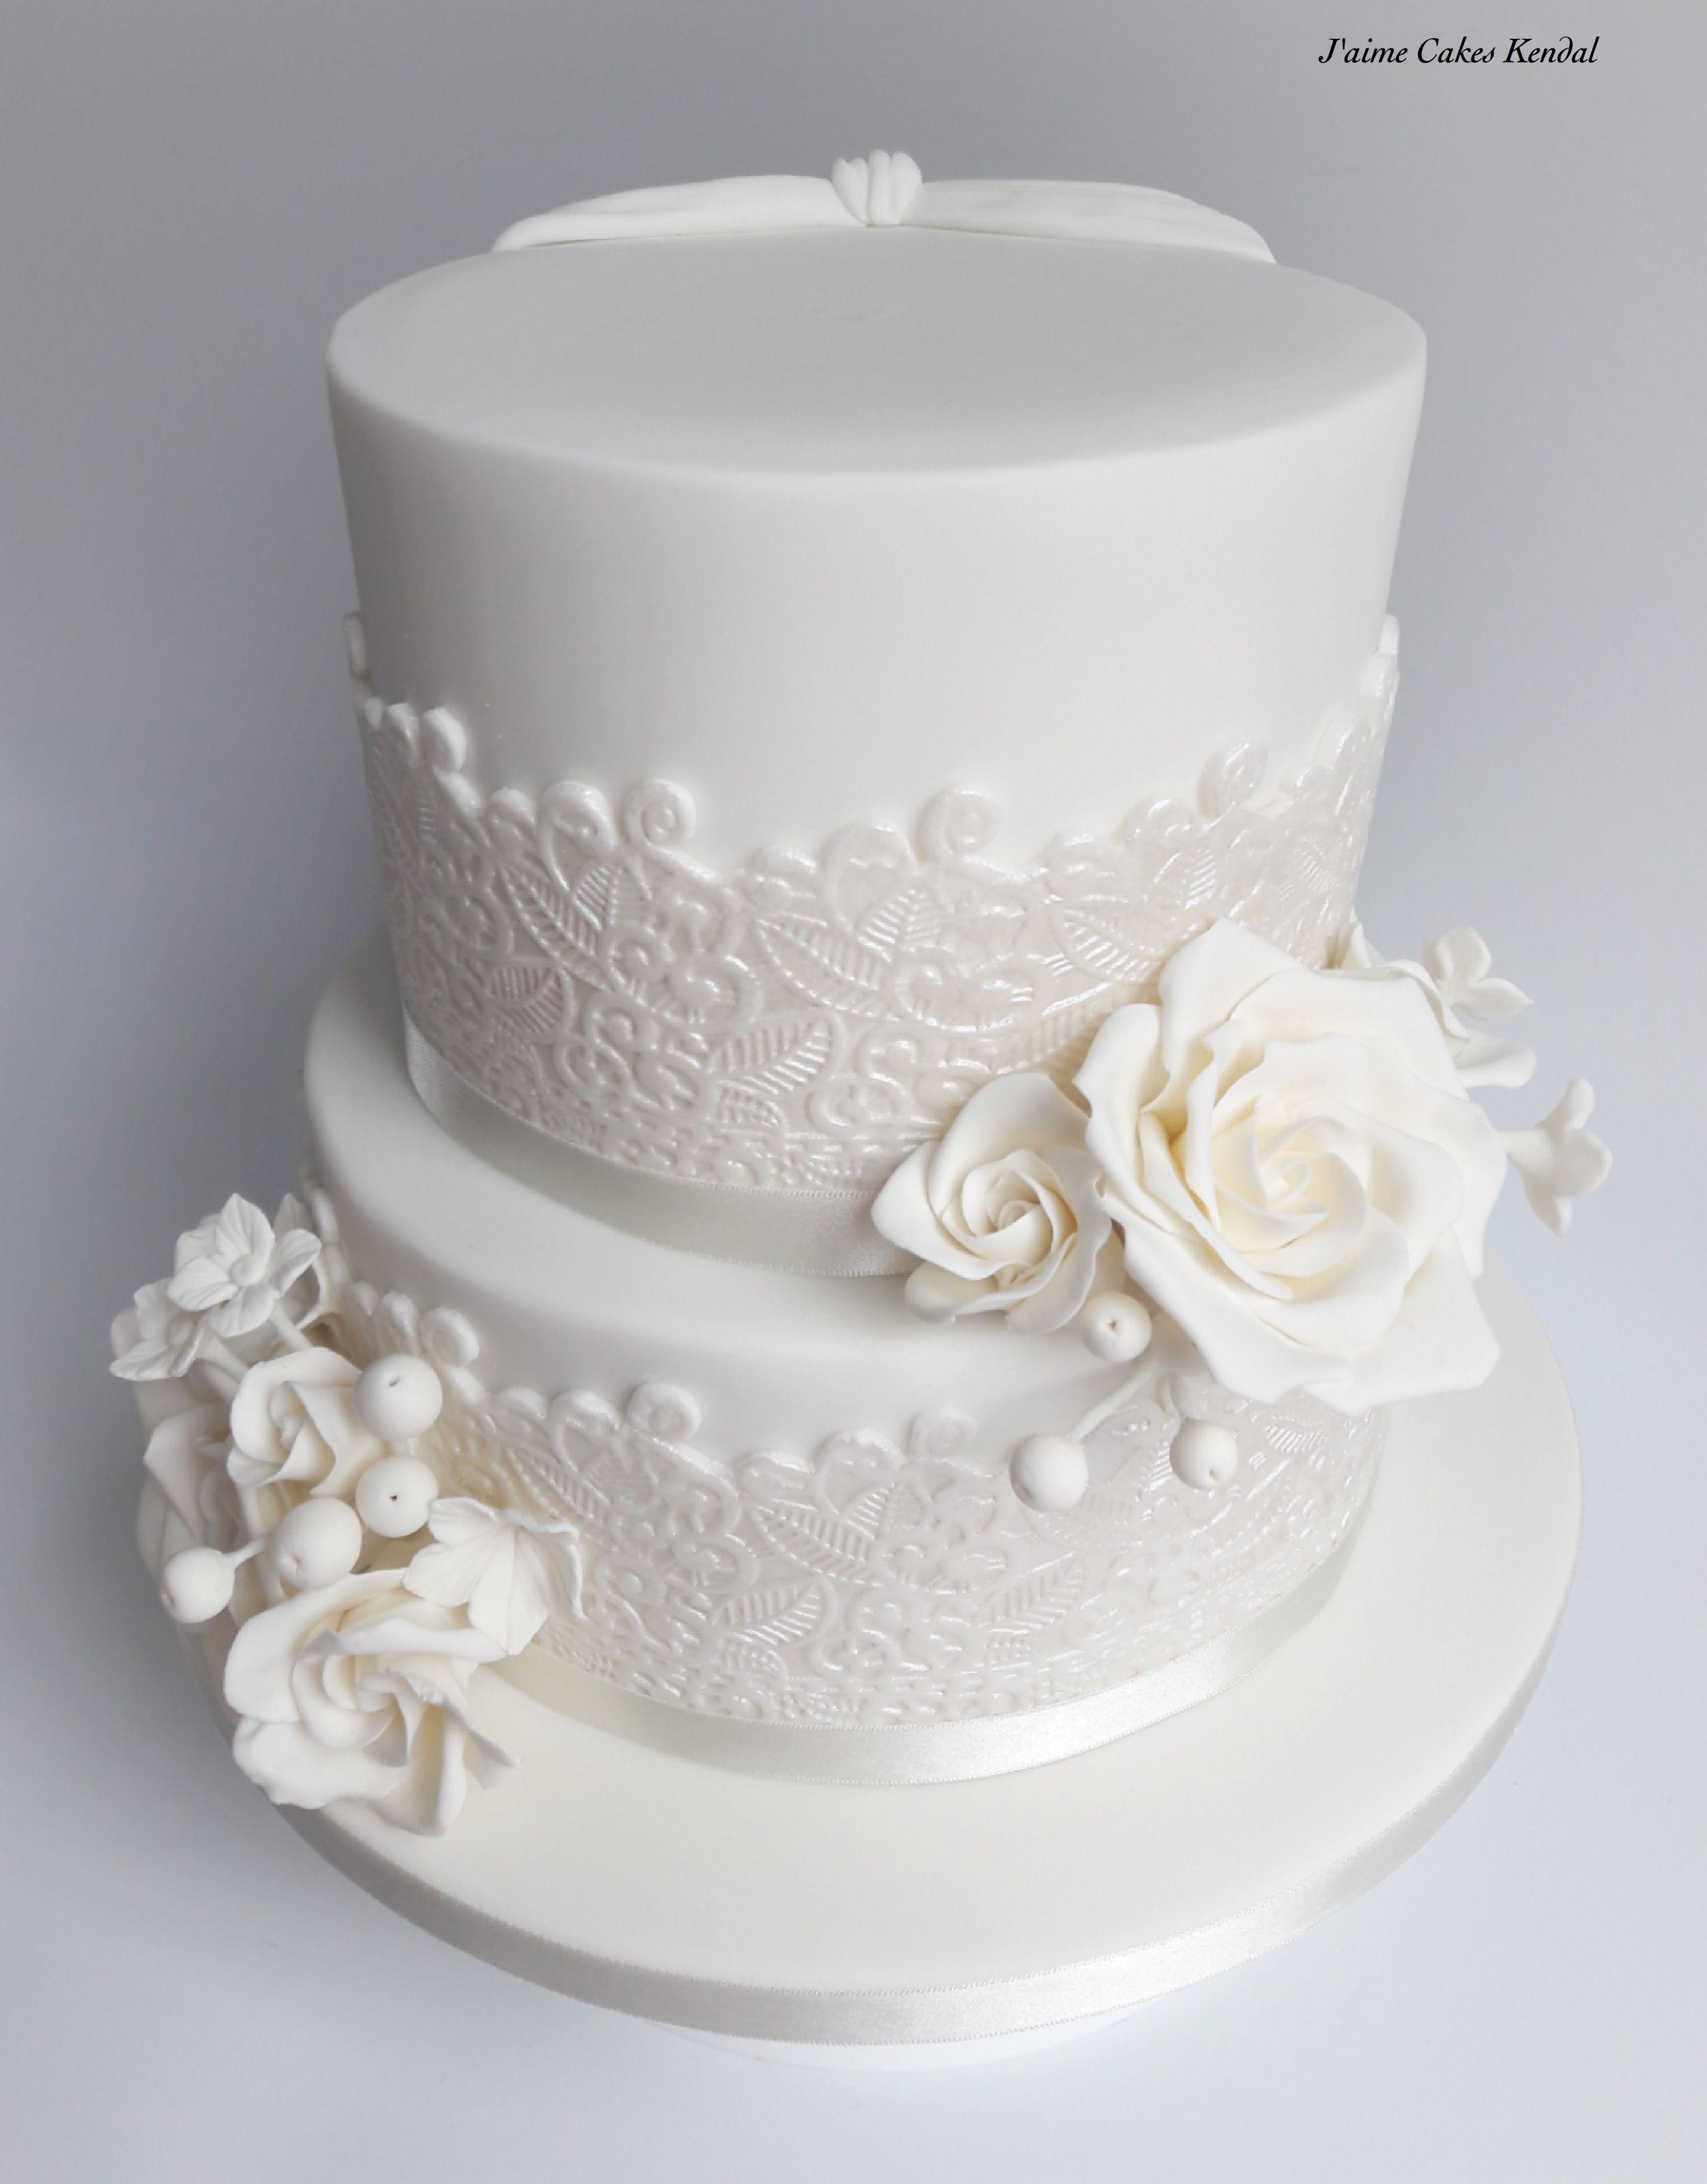 Lace & flowers wedding Cake in 2019 Diamond wedding